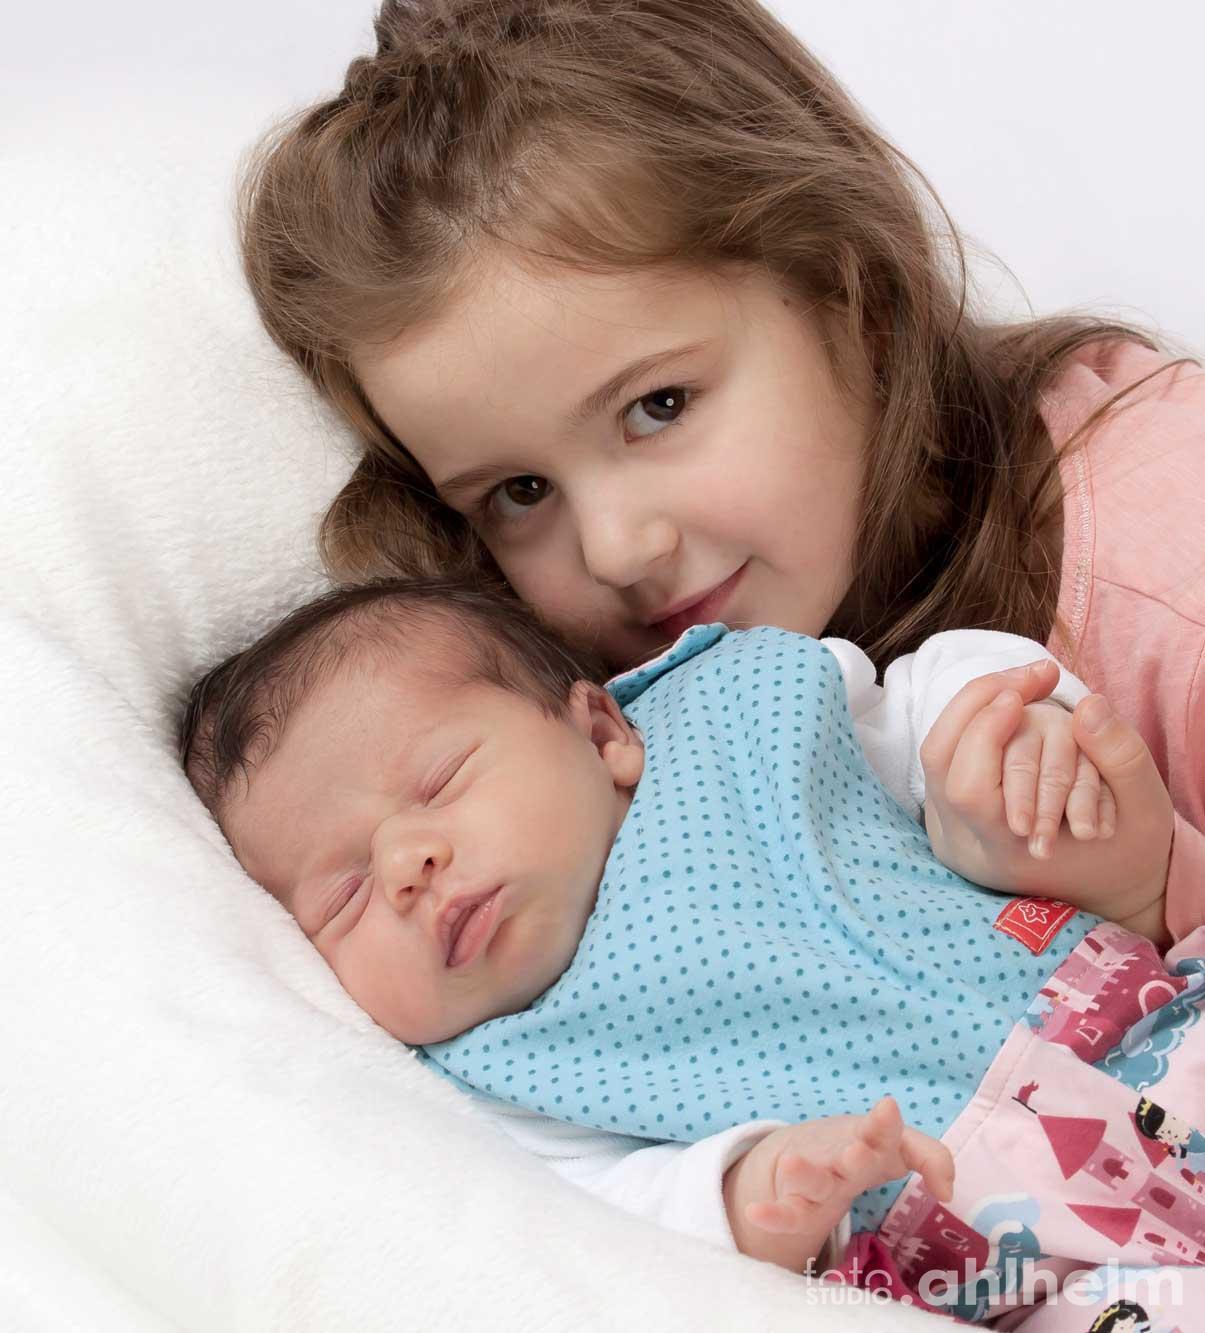 Fotostudio Ahlhelm Kinder Baby mit großer Schwester